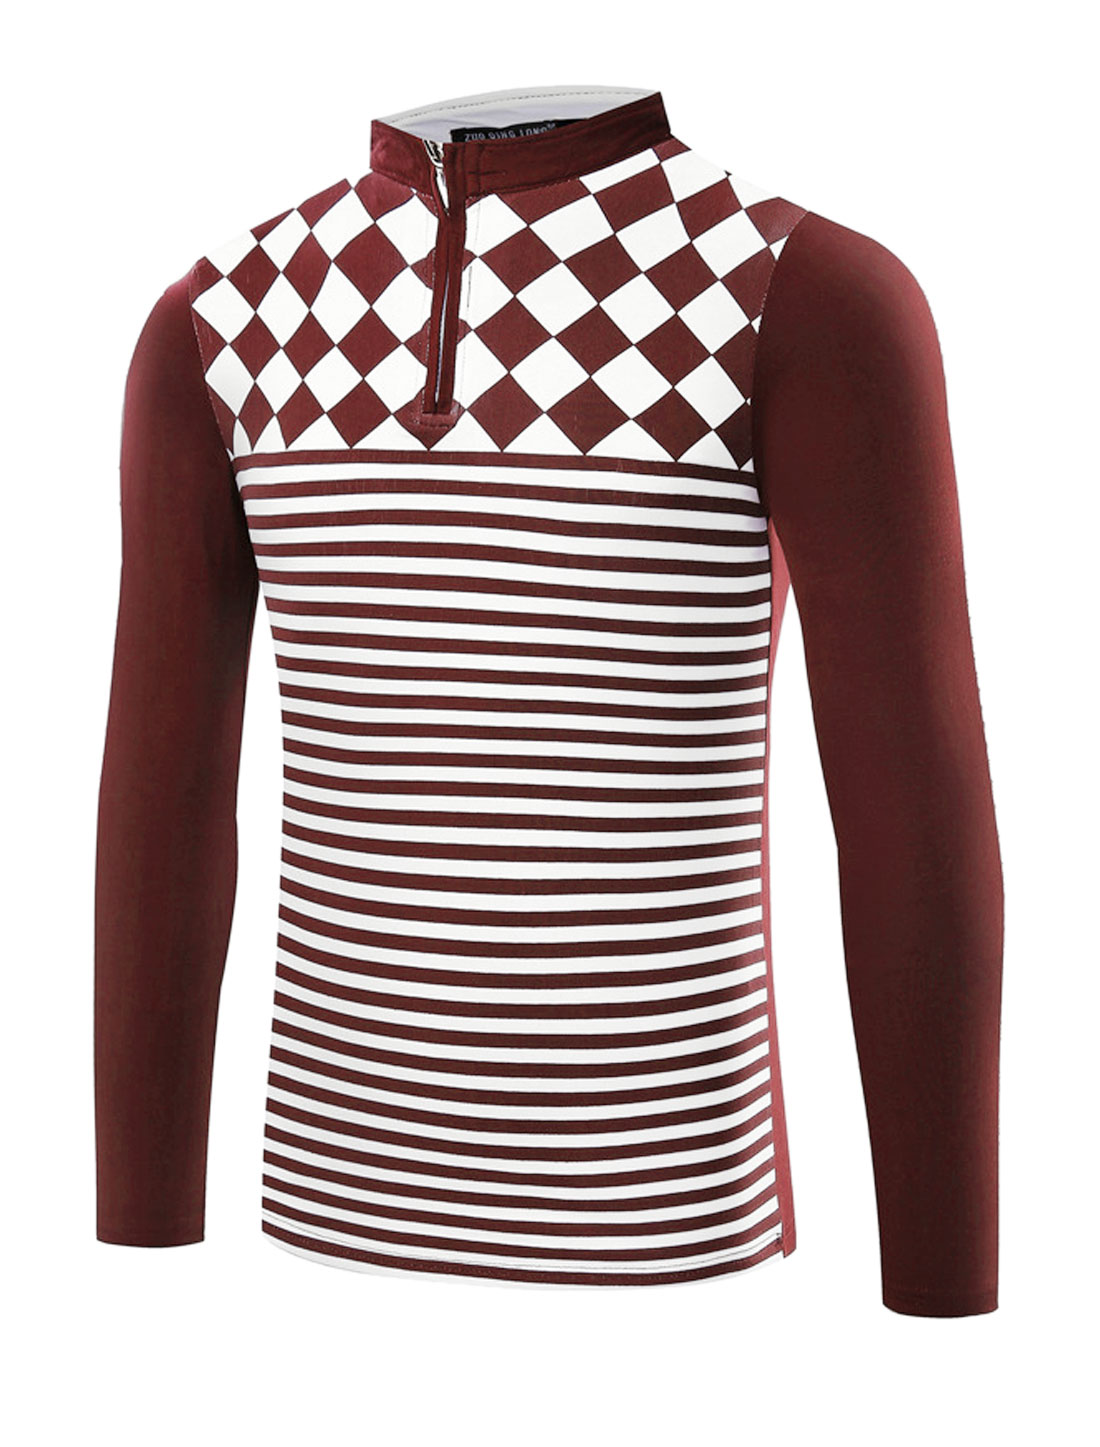 Man Collared Half Zipper Argyle Stripes T-Shirt Red M